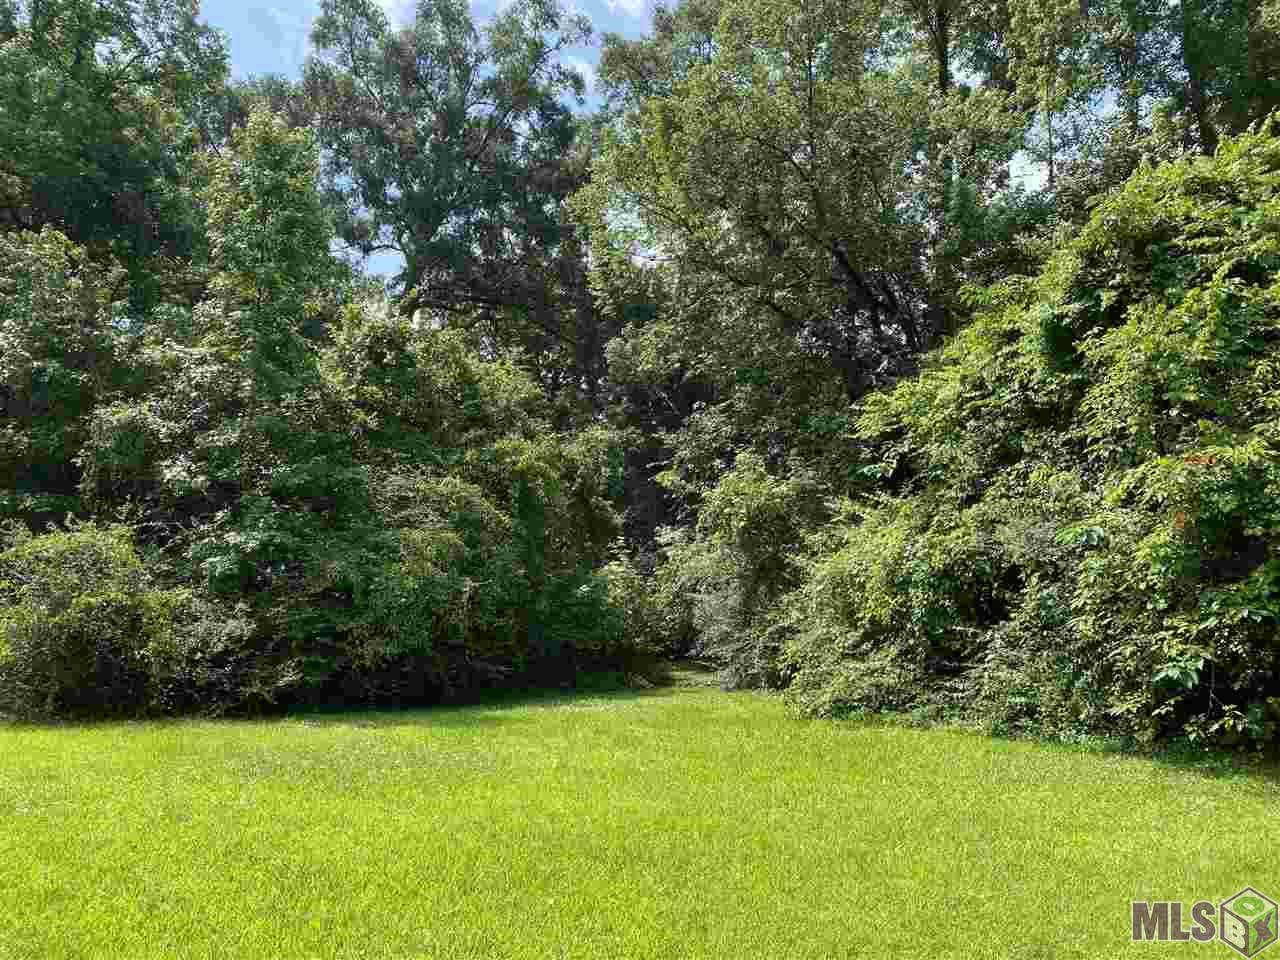 244 Magnolia Wood Ave - Photo 1